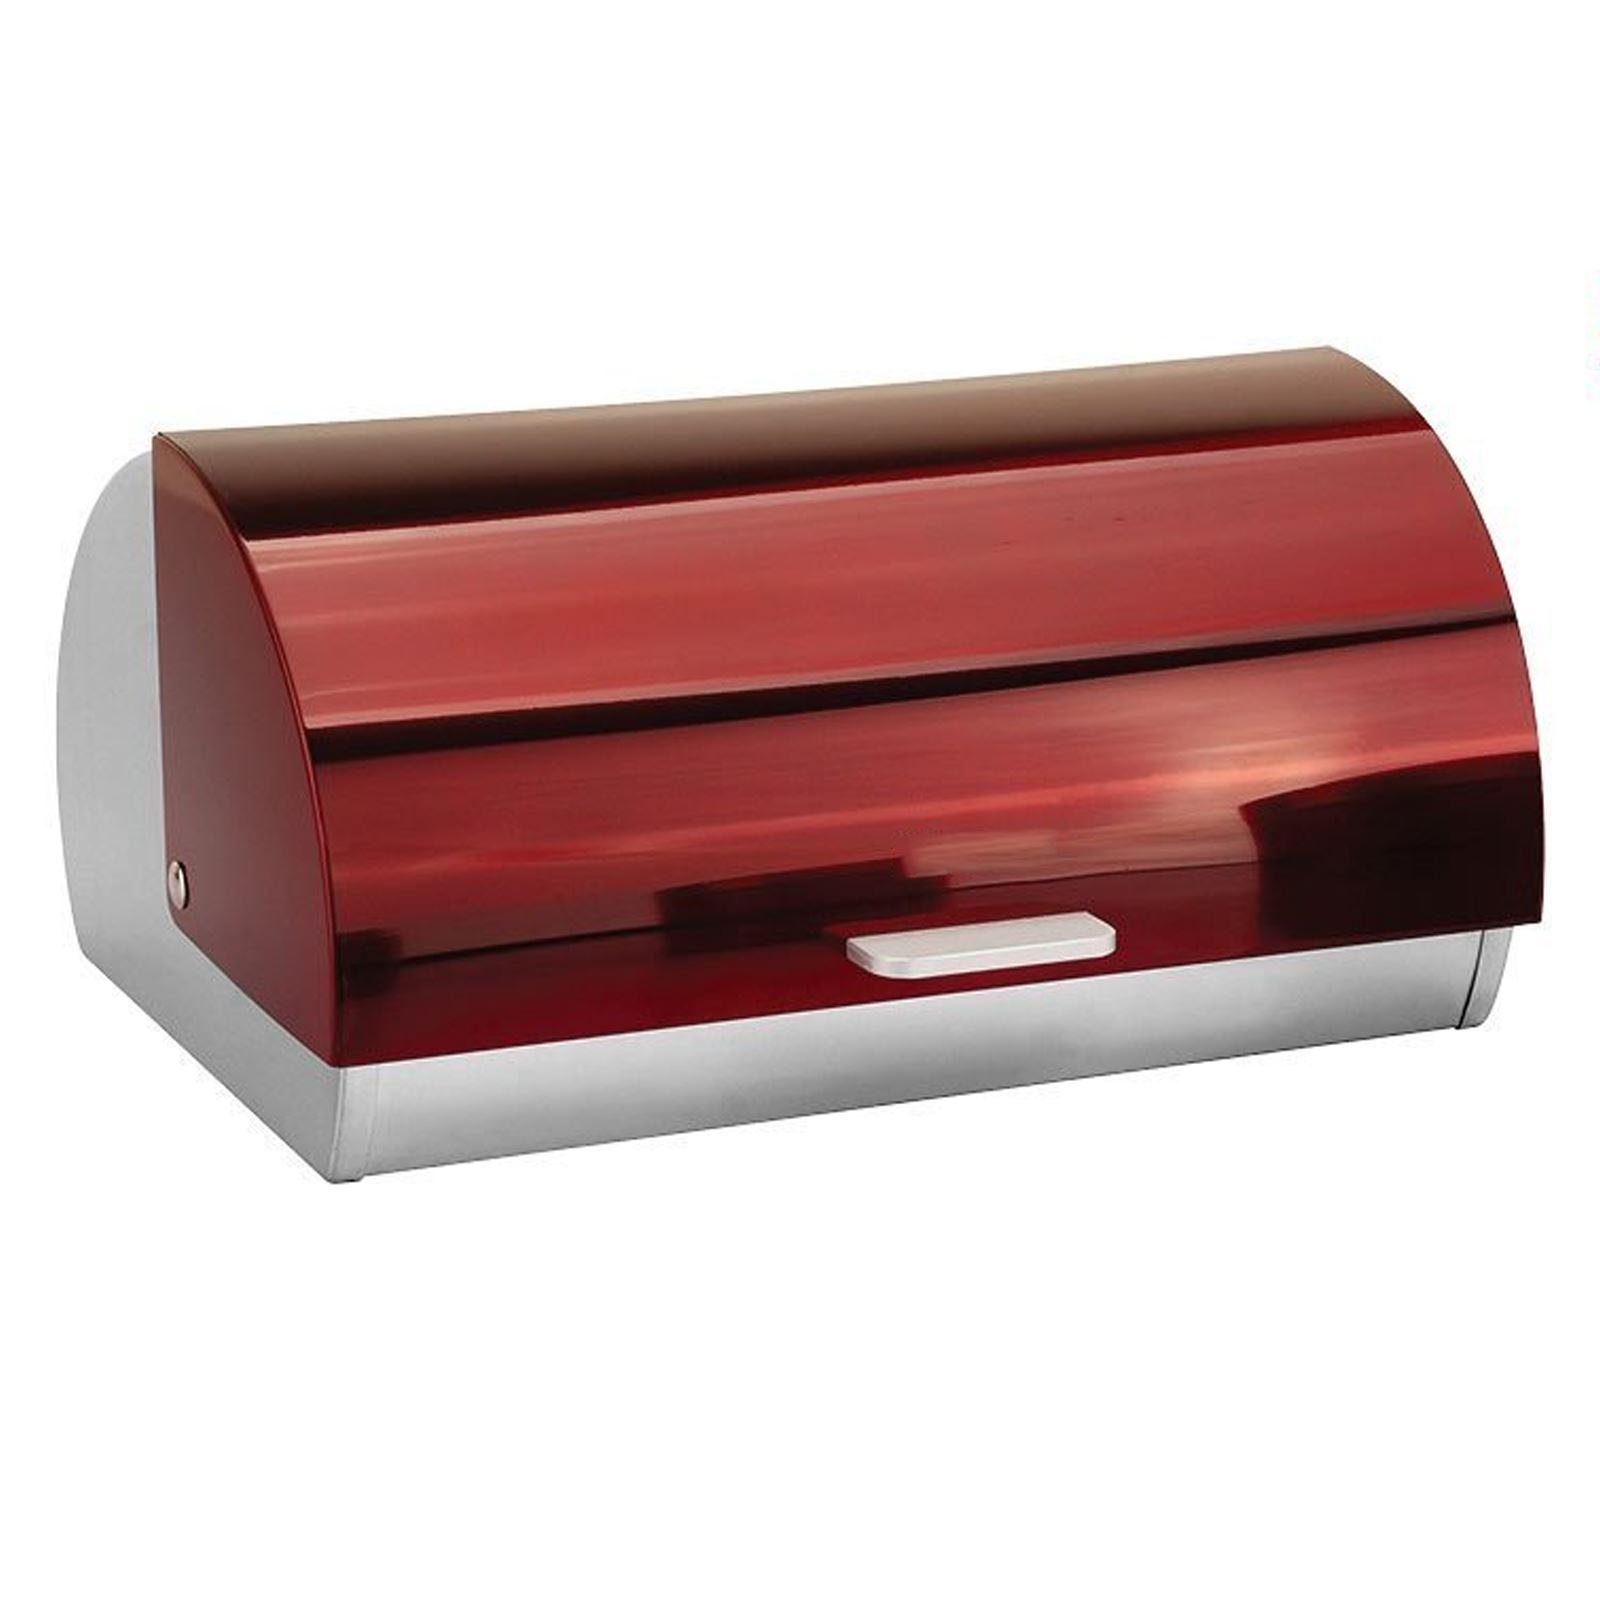 Metallic-Roll-Top-Bread-Bin-Tea-Coffee-Sugar-Jar-Canister-Sets-Kitchen-Storage thumbnail 25